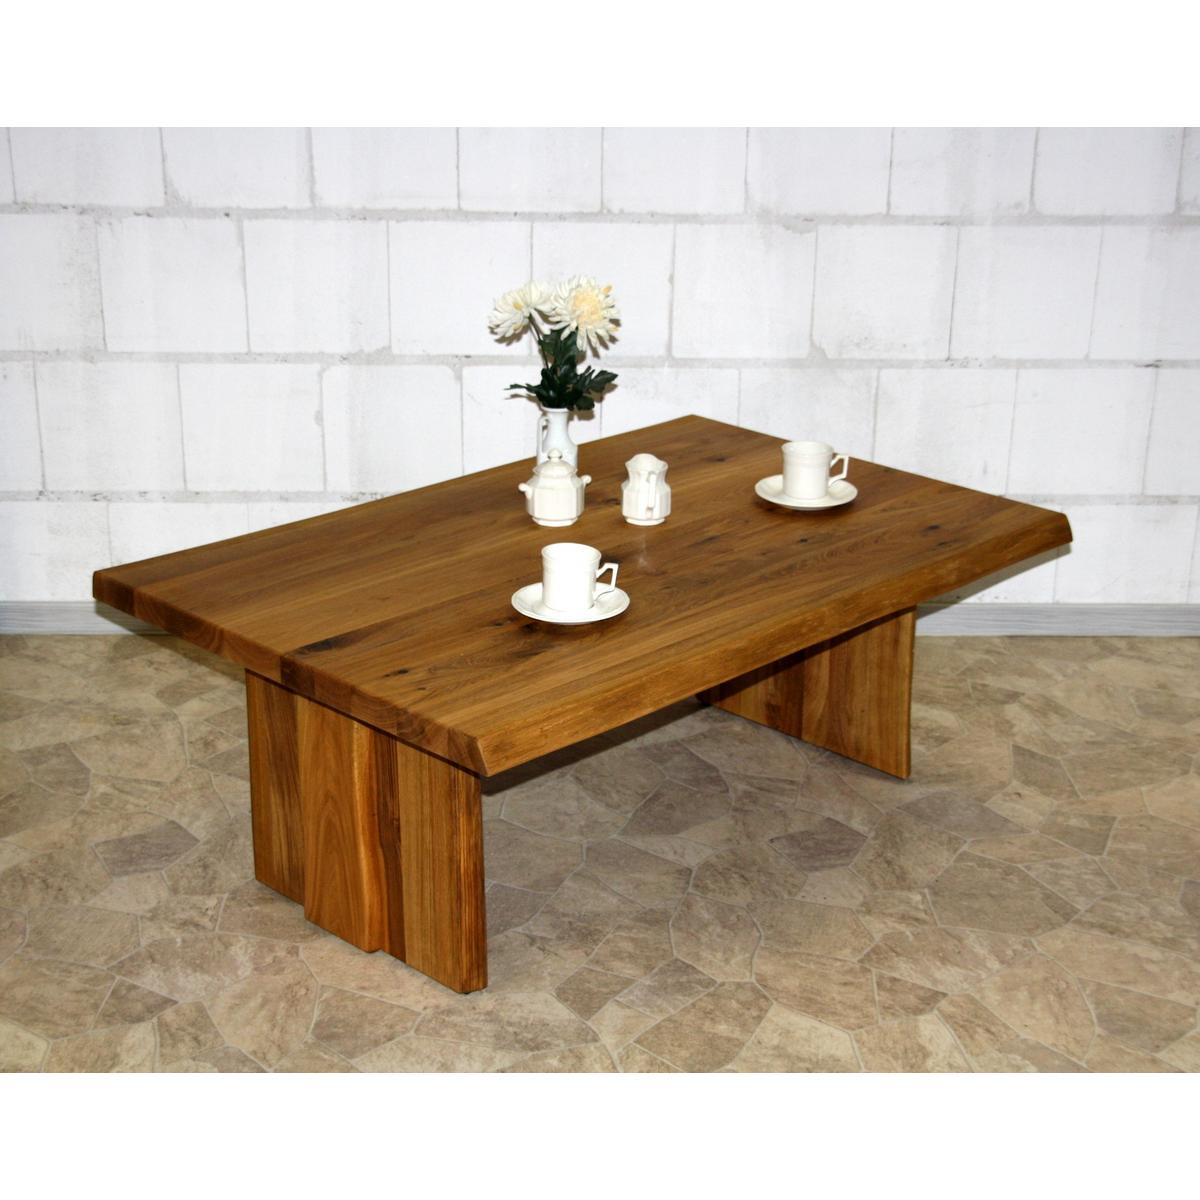 90 echtholz wohnzimmertisch massiver echtholz tisch. Black Bedroom Furniture Sets. Home Design Ideas